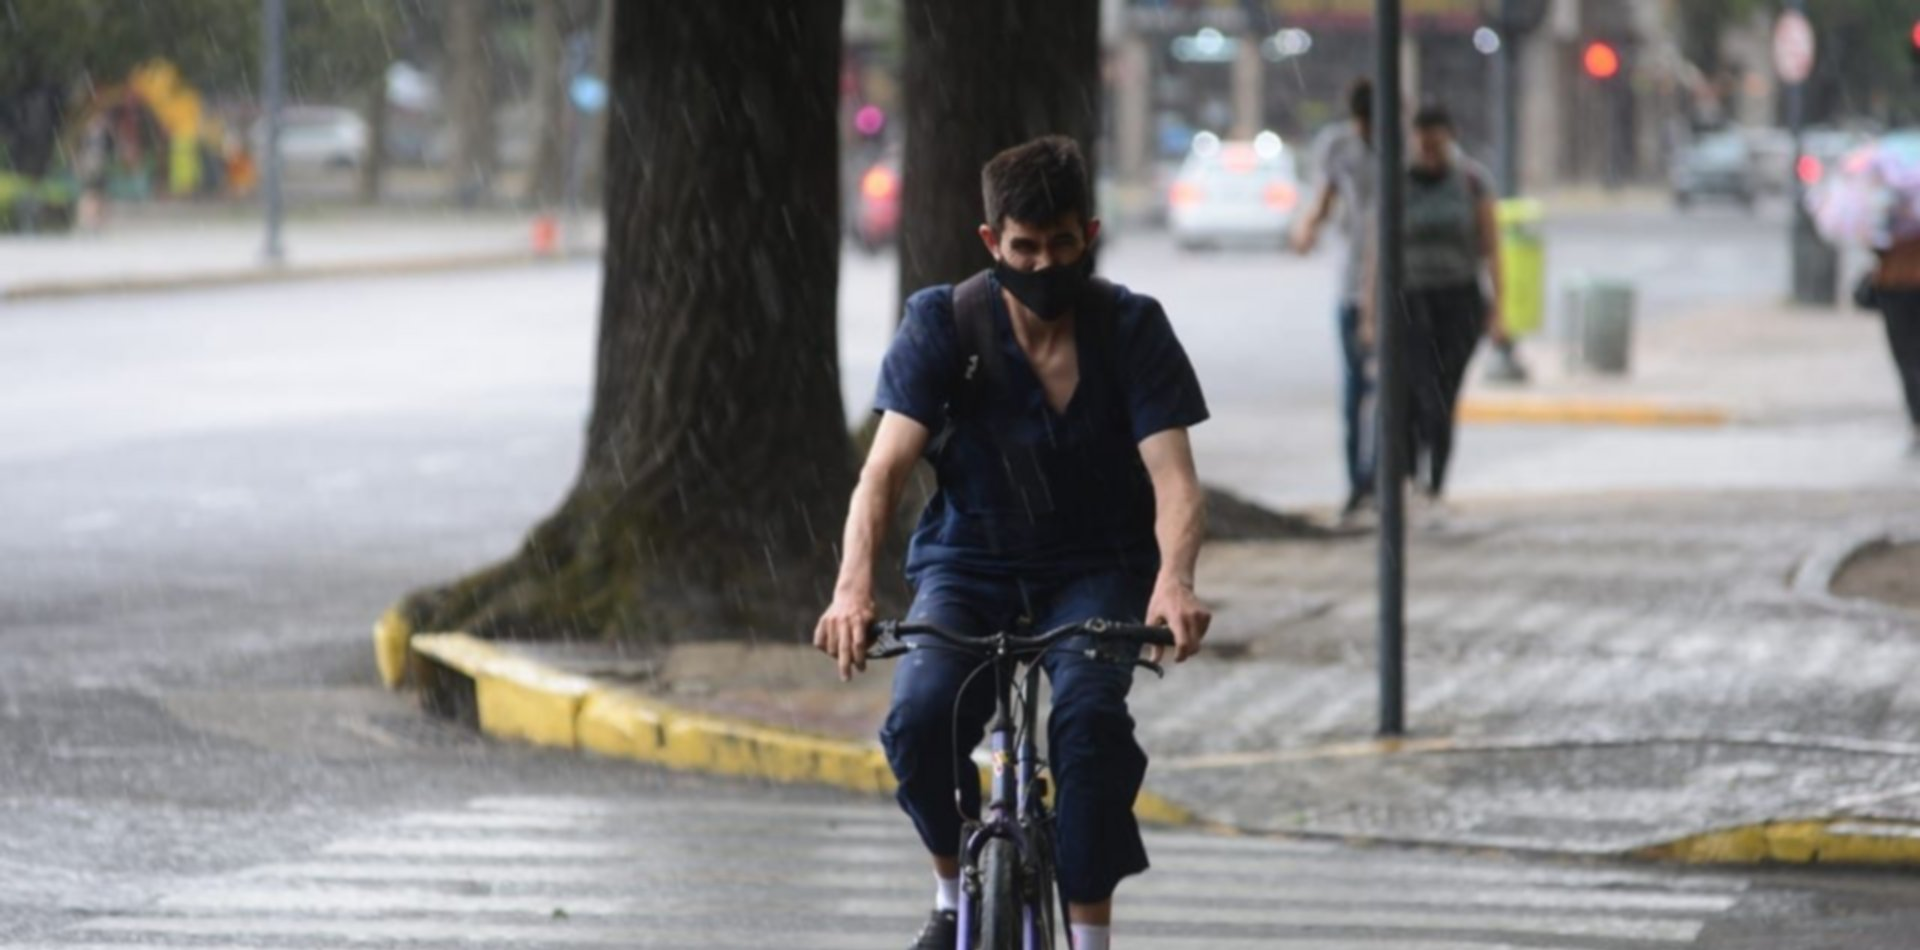 Se esperan tormentas para este sábado en La Plata